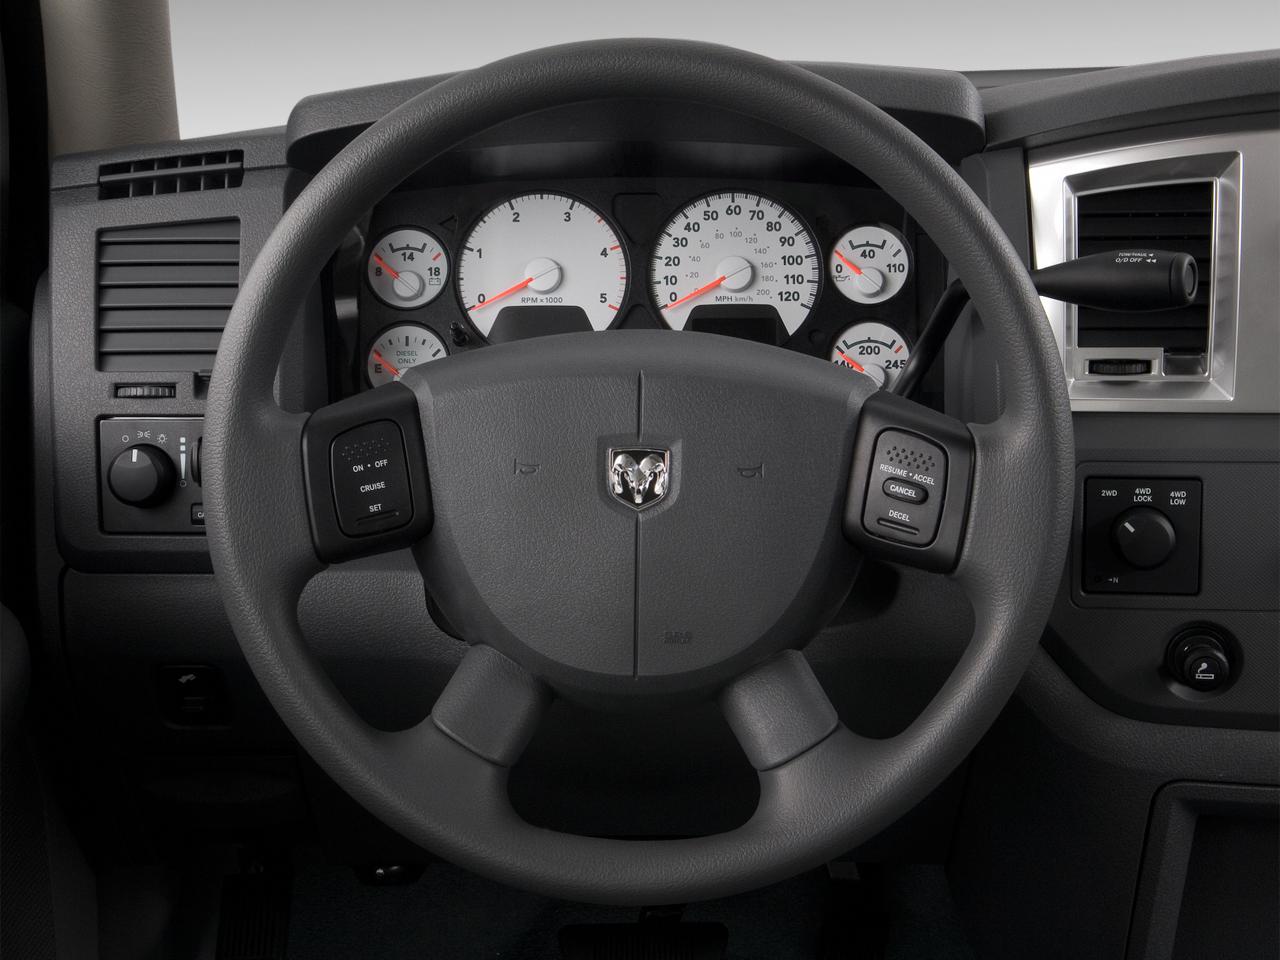 DODGE 2500 interior